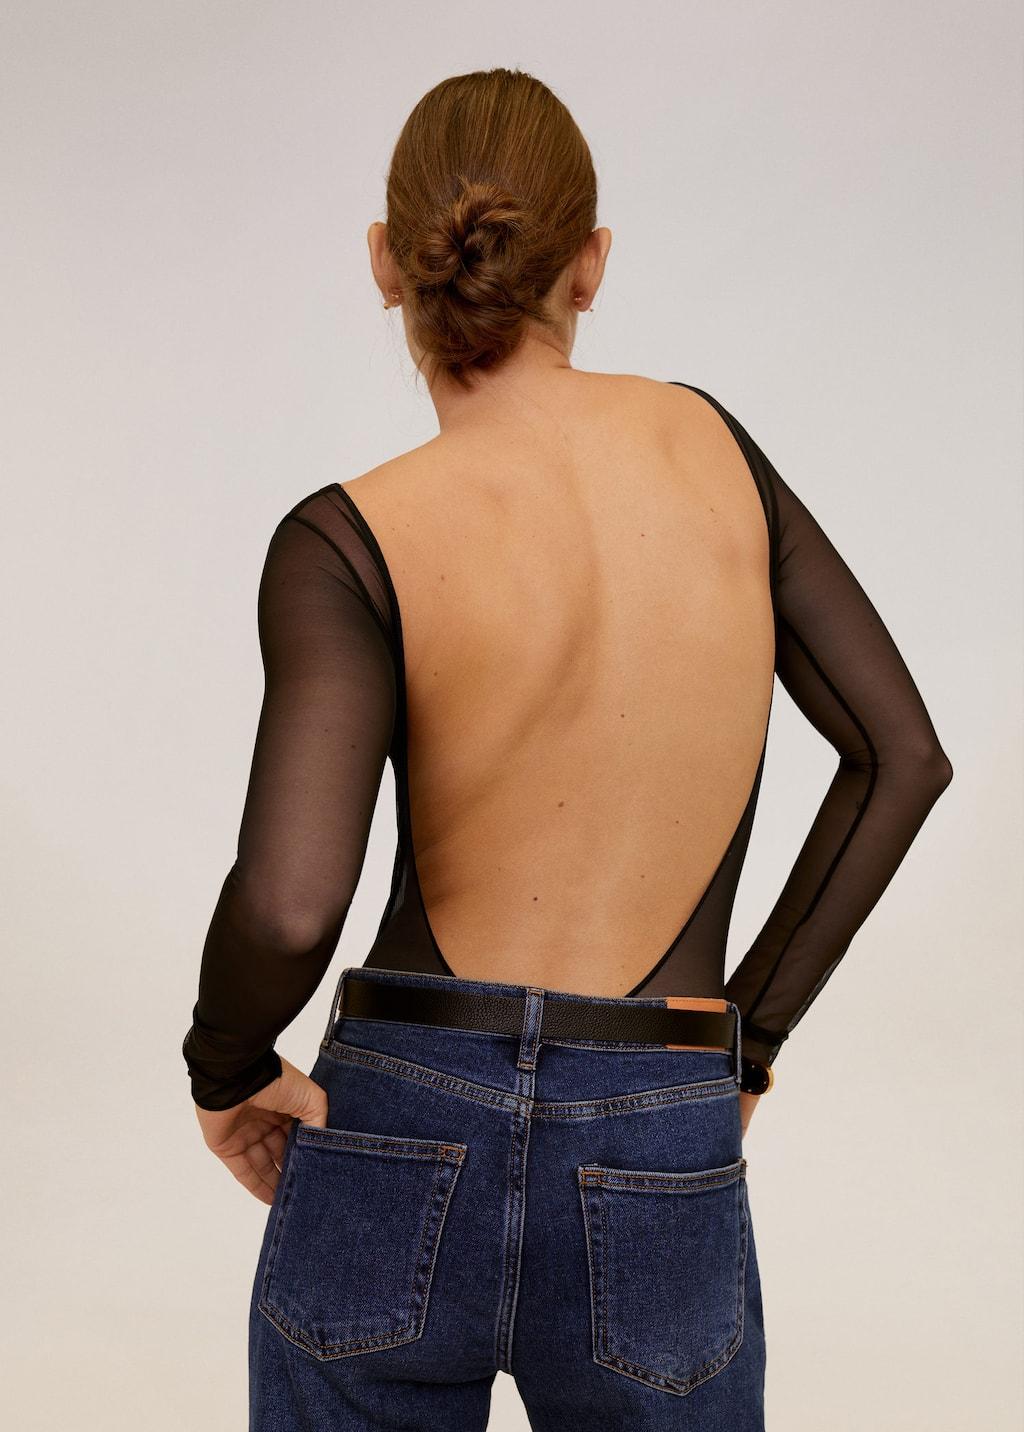 Body mit rückwärtigem Ausschnitt - Rückseite des Artikels